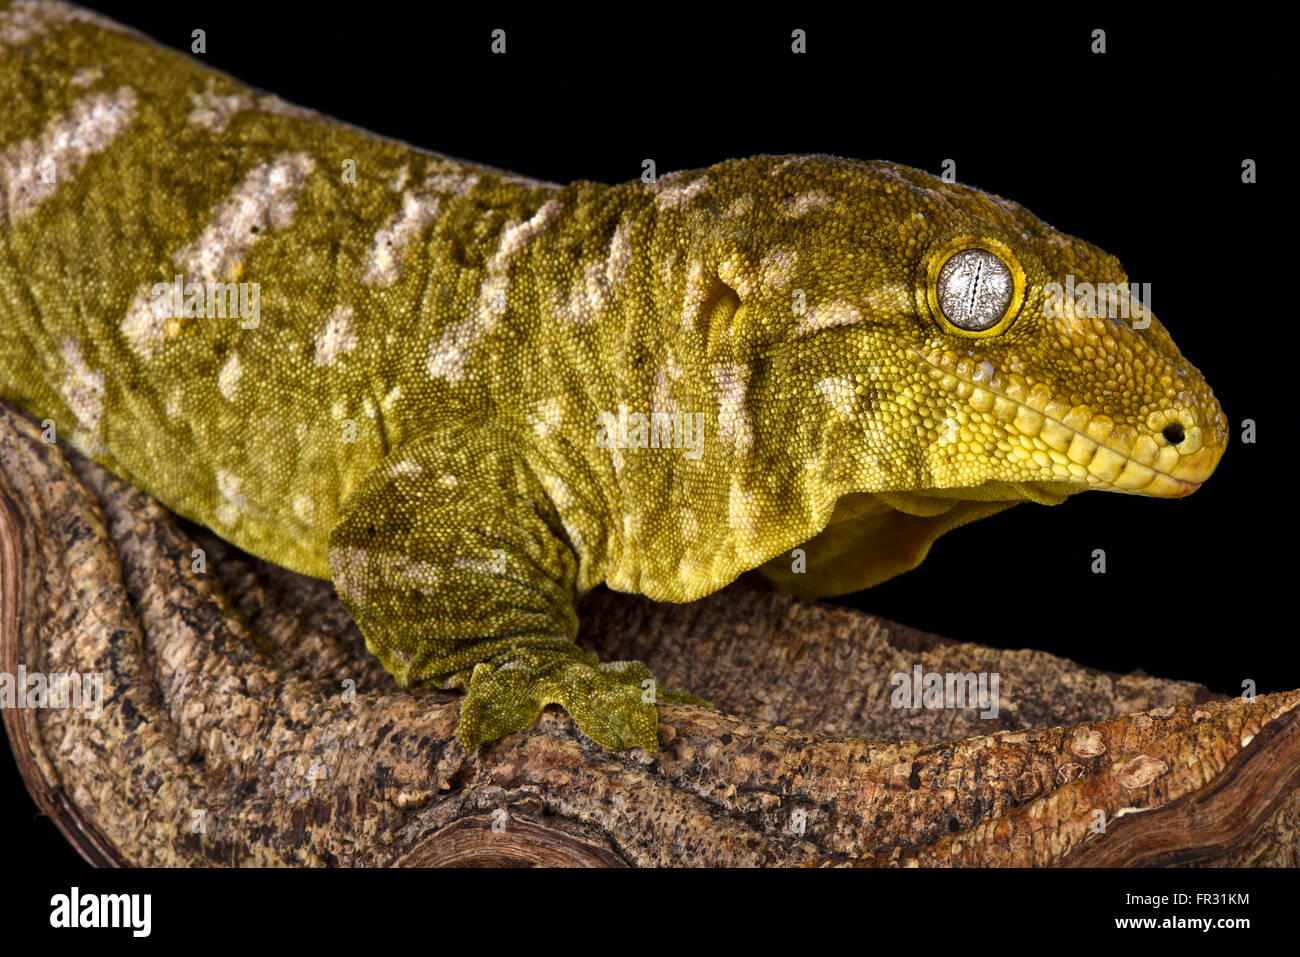 Giant gecko (Rhacodactylus laechianus) - Stock Image